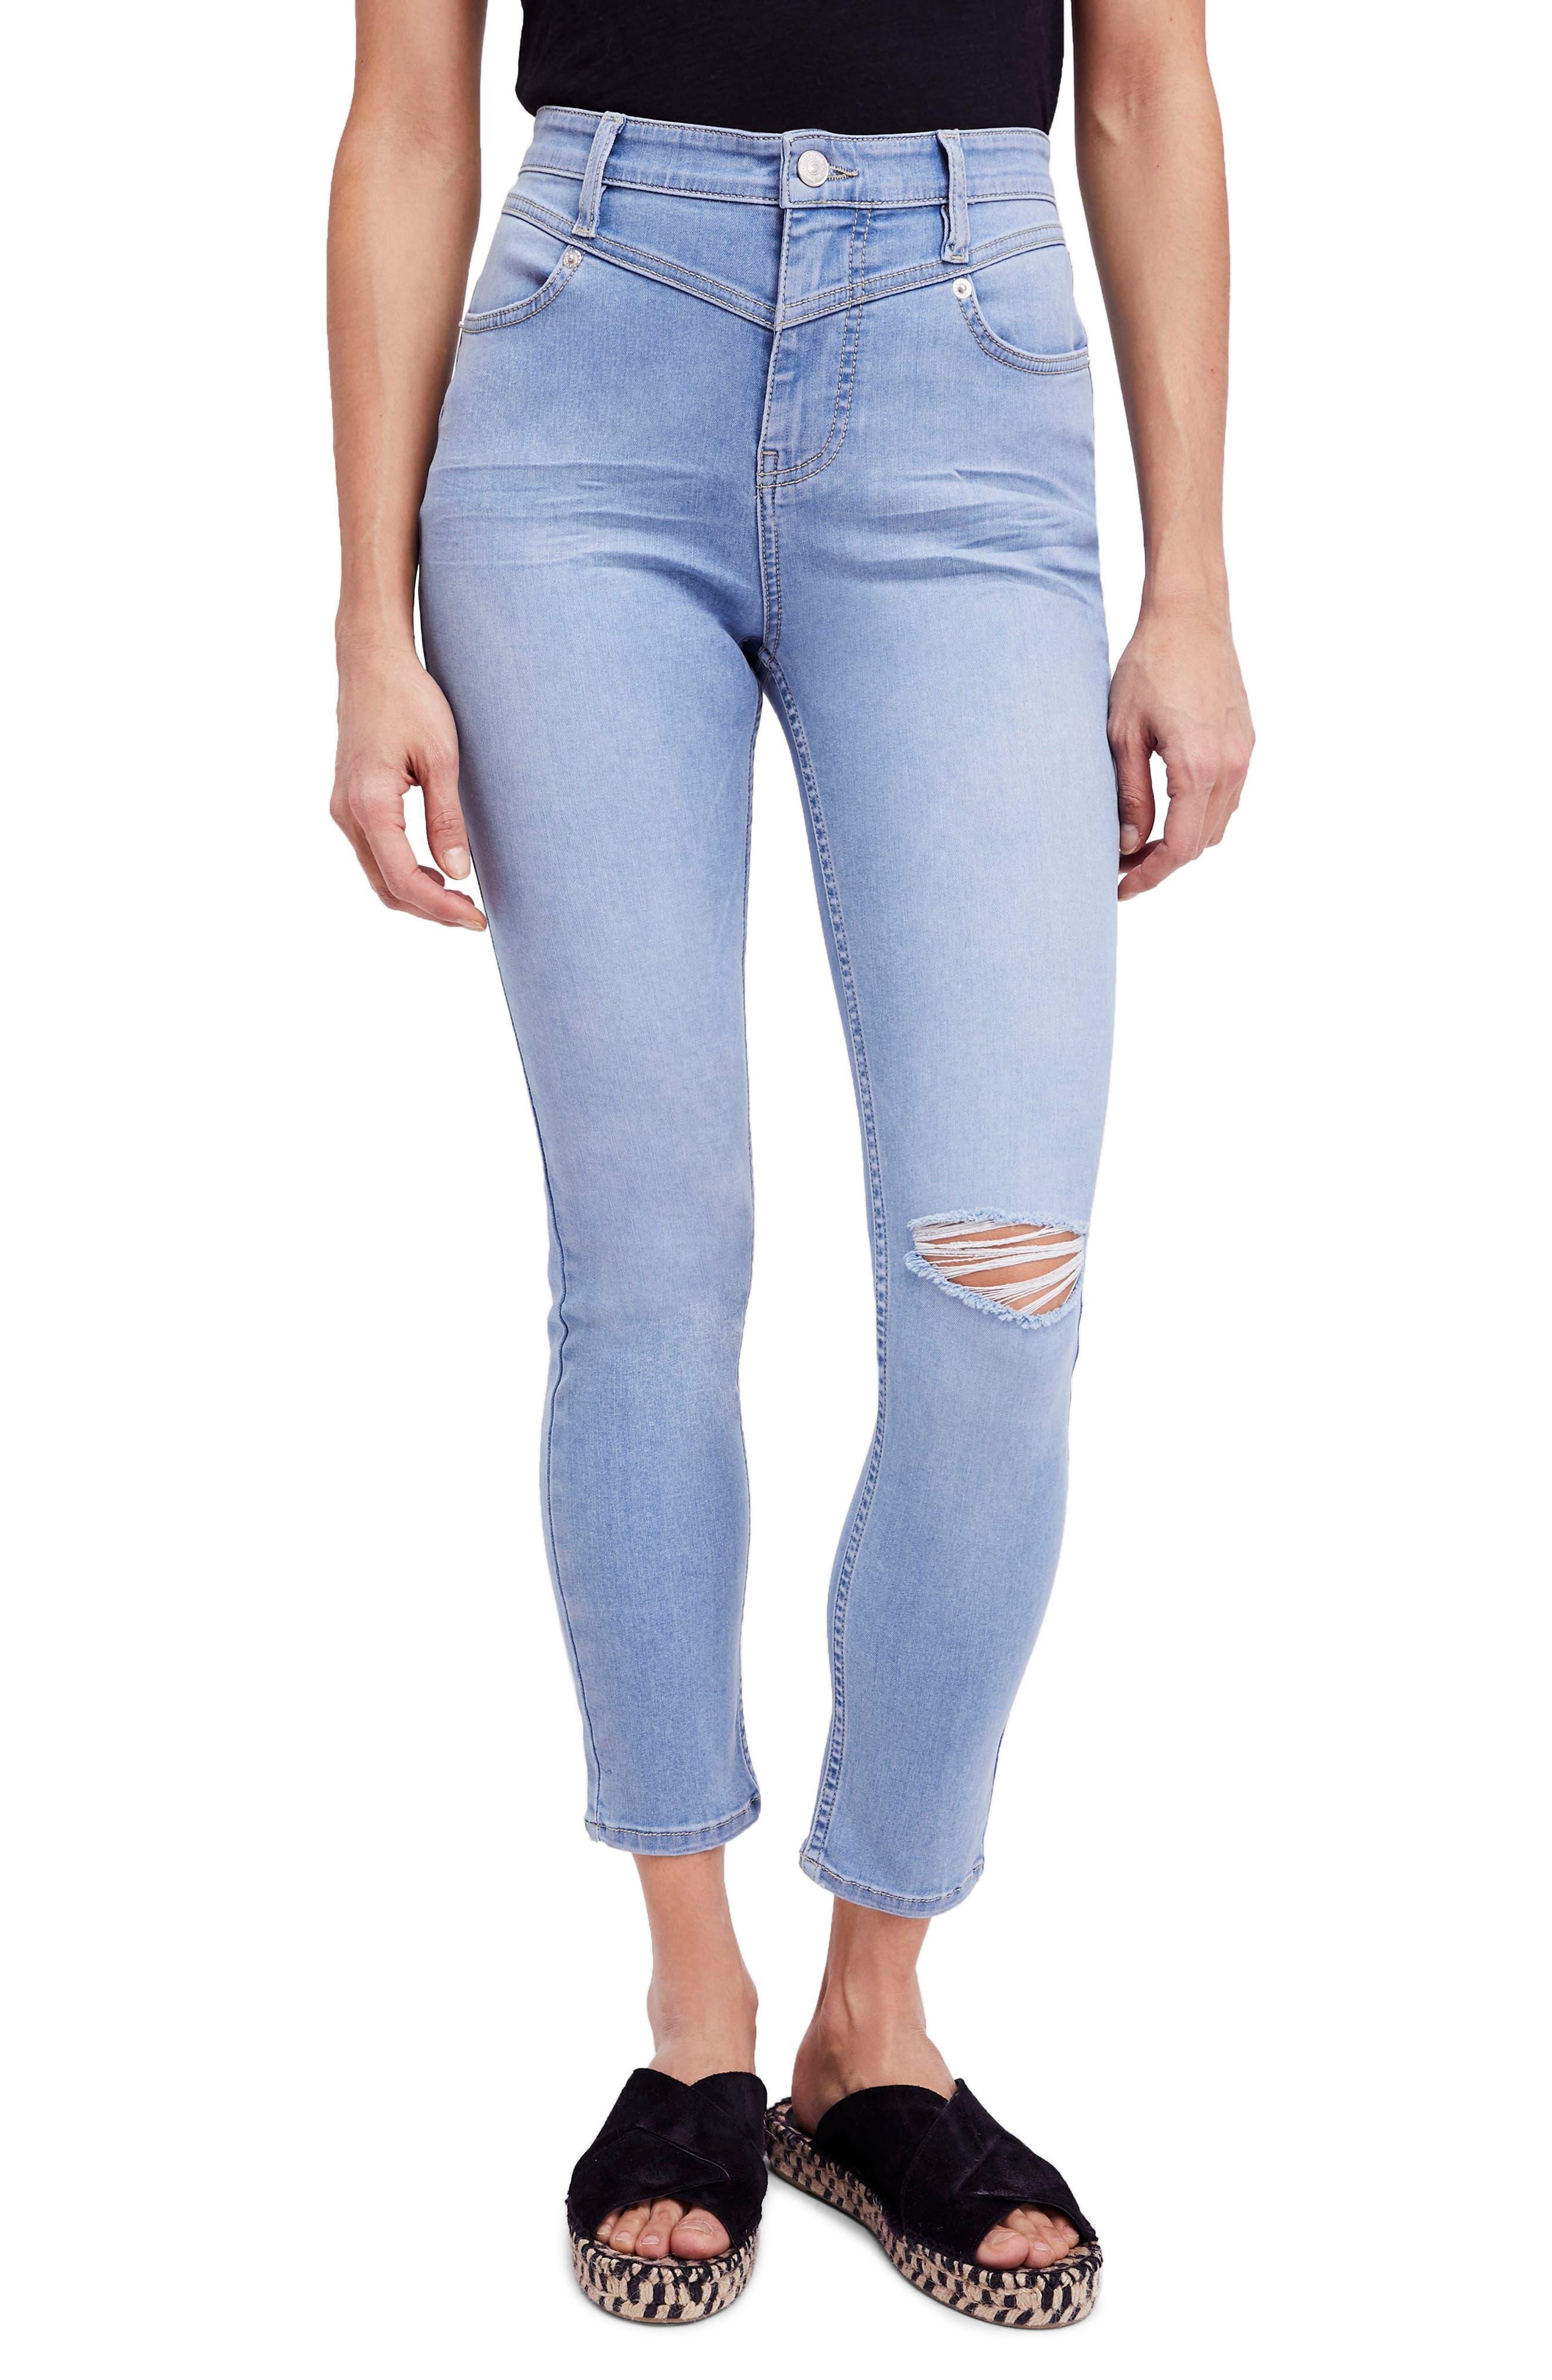 Mara Skinny Jeans,                             Main thumbnail 1, color,                             400